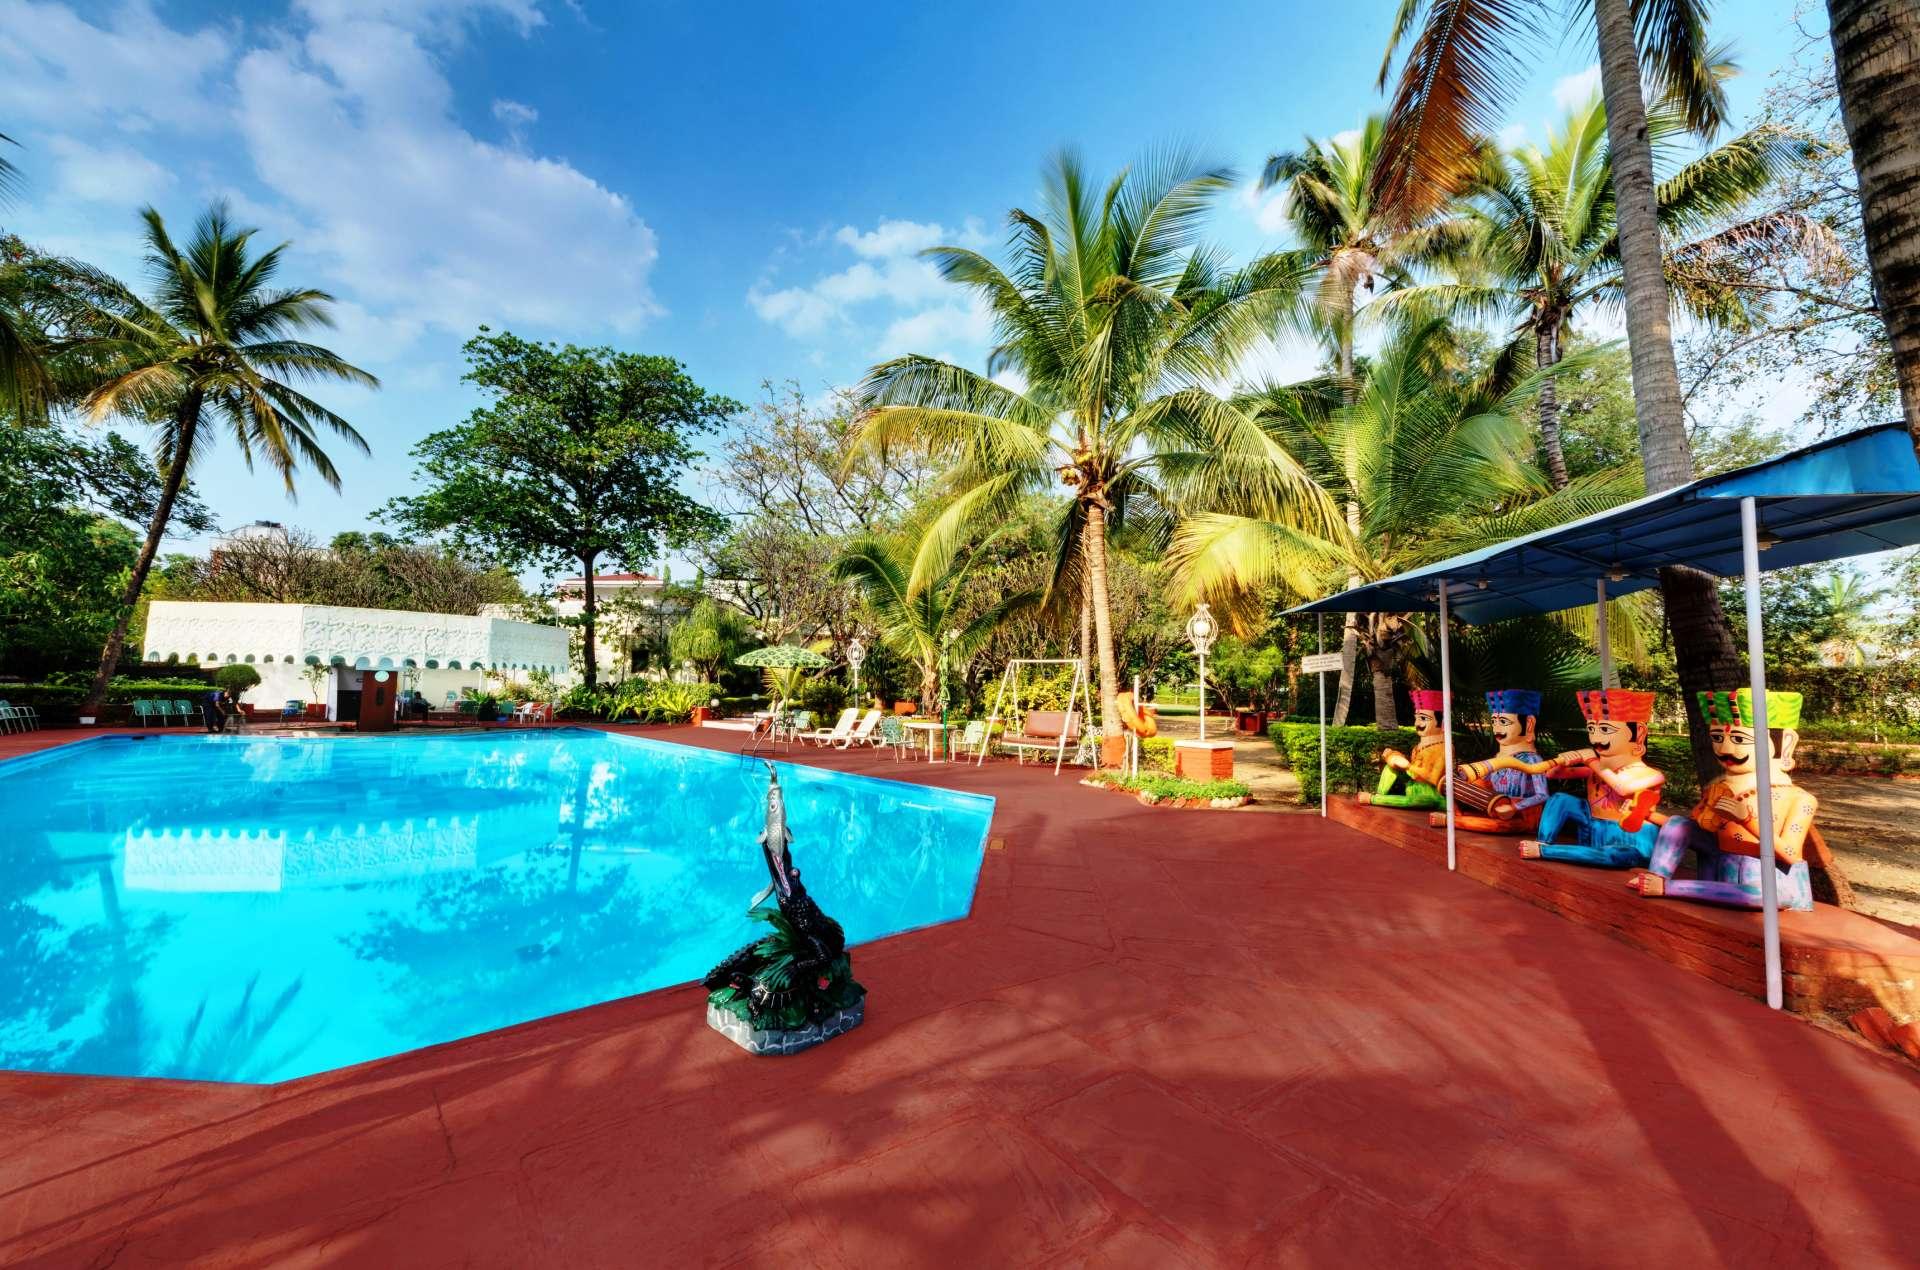 swimming pool ambassador ajanta aurangabad - The Ambassador | Heritage Hotels in Mumbai, Aurangabad, Chennai - Ambassador Ajanta Aurangabad